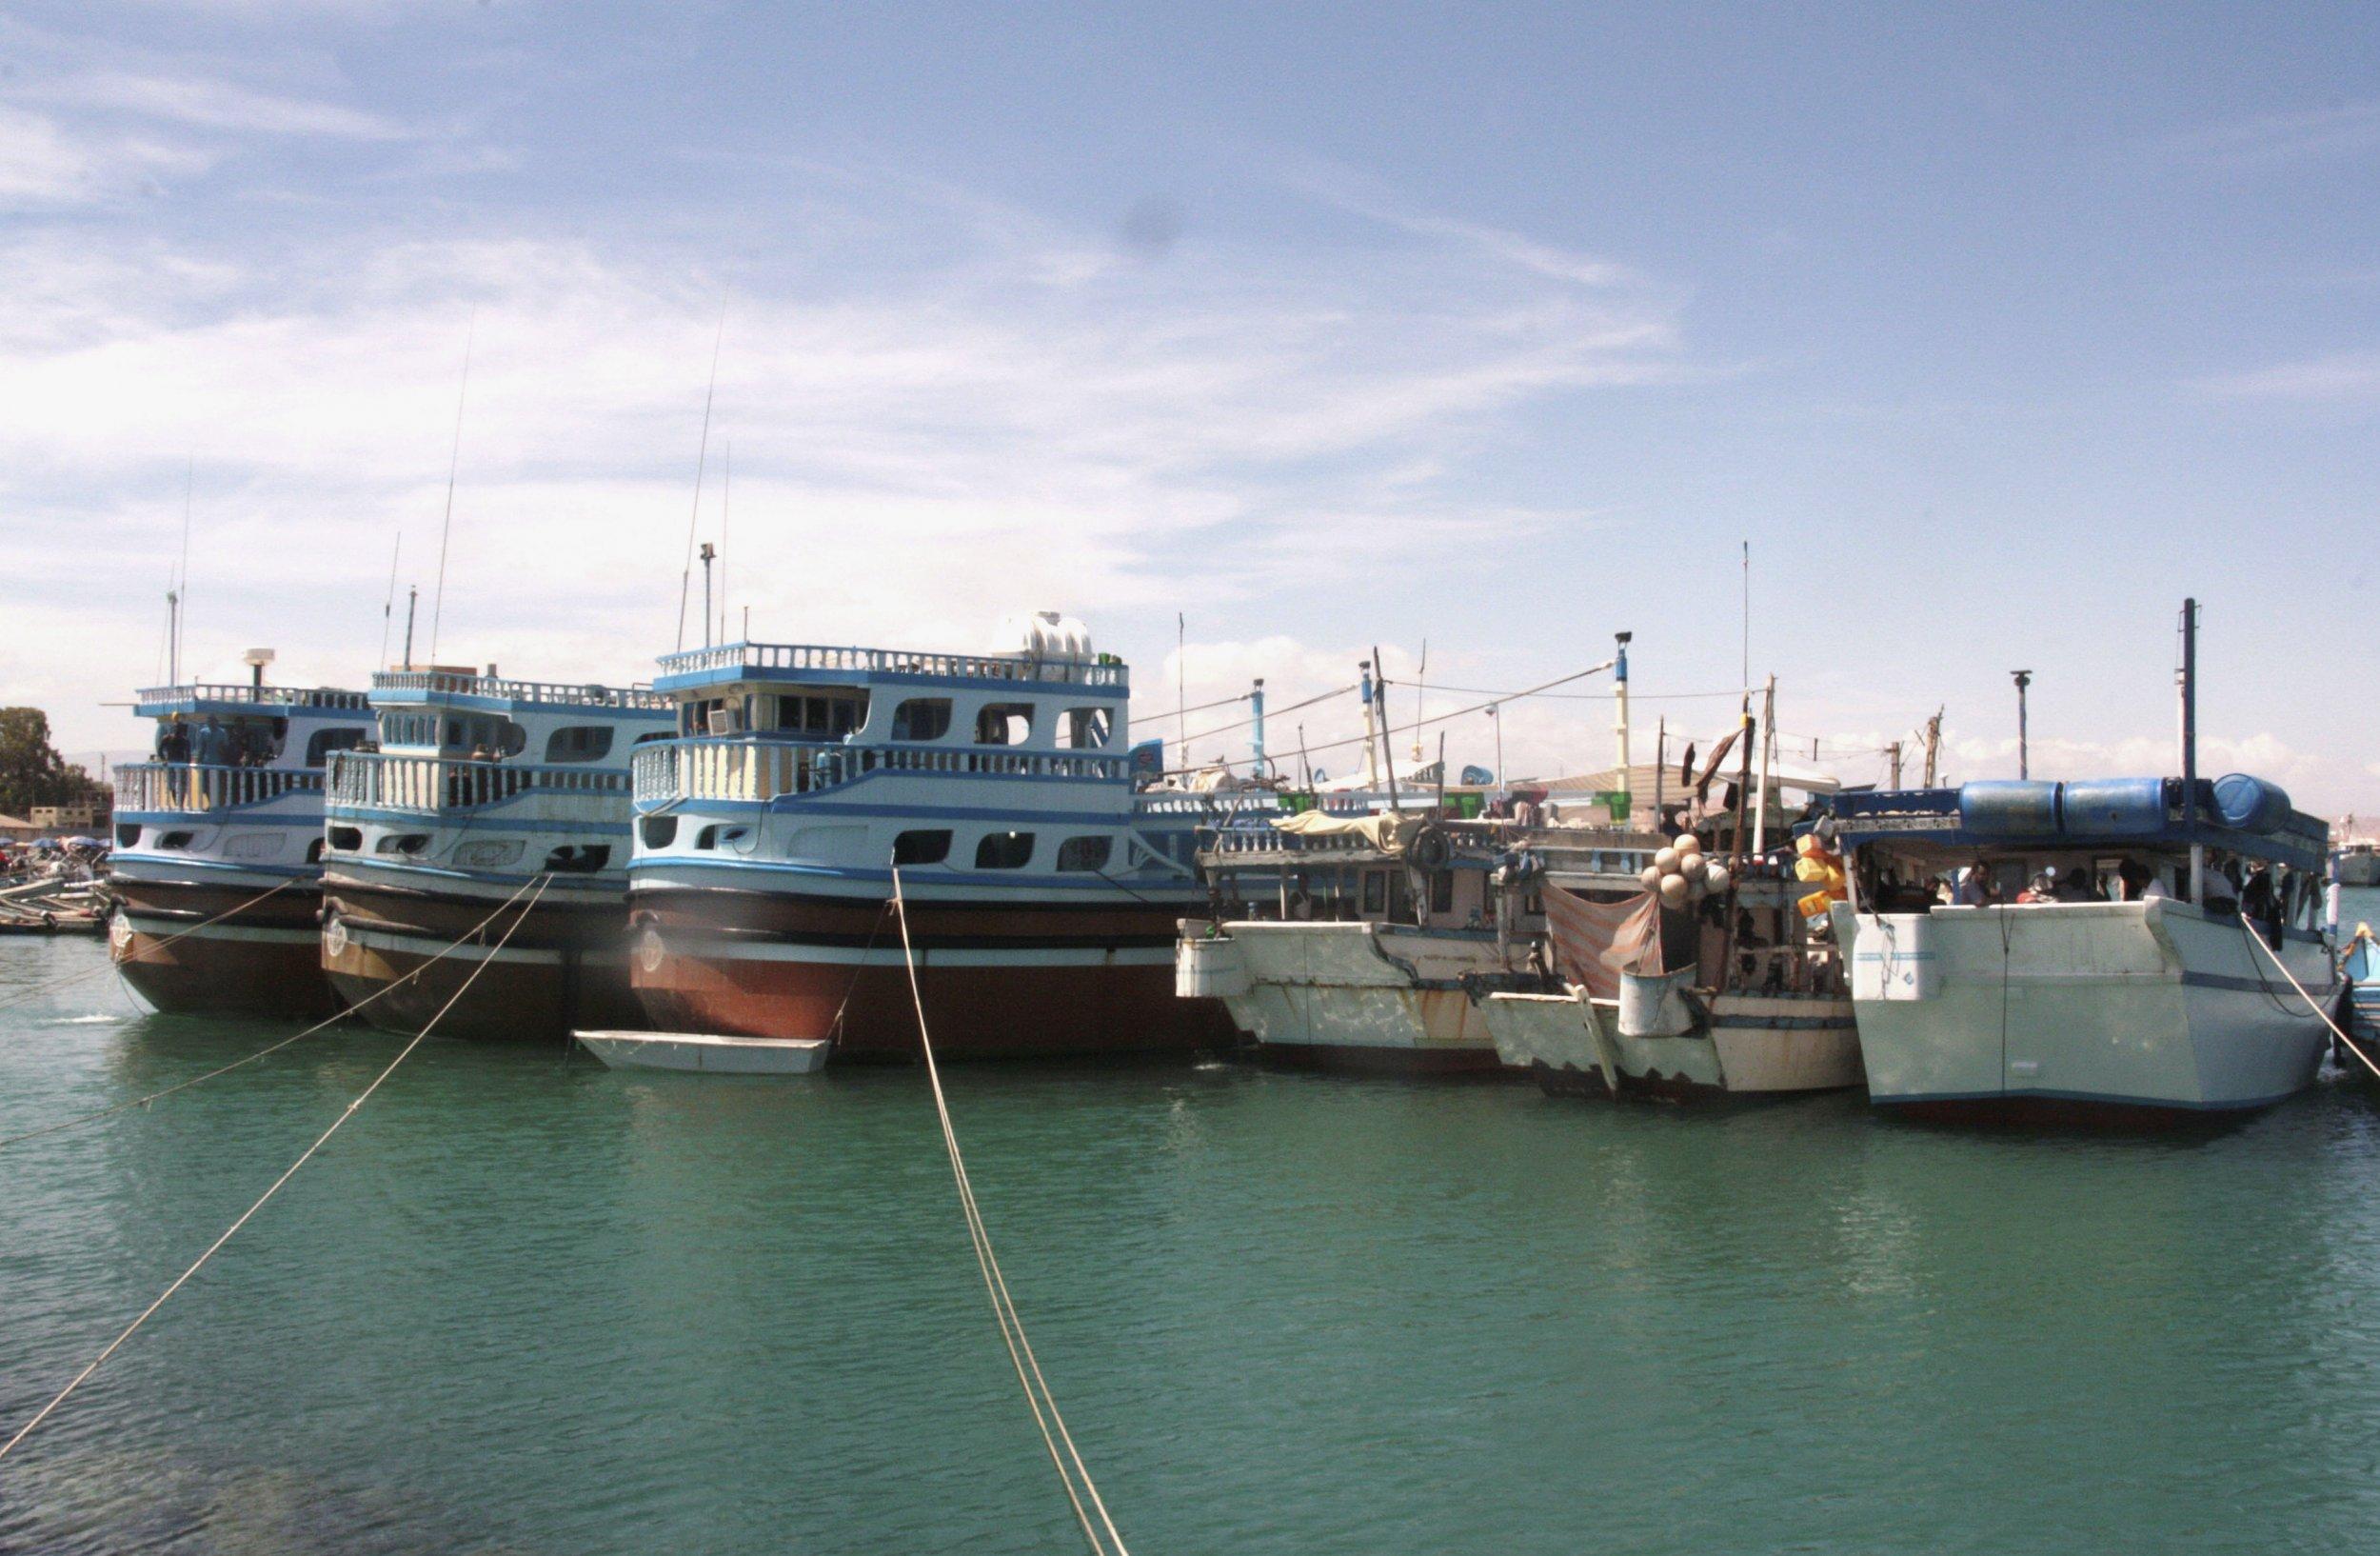 Fishing vessels in Puntland.